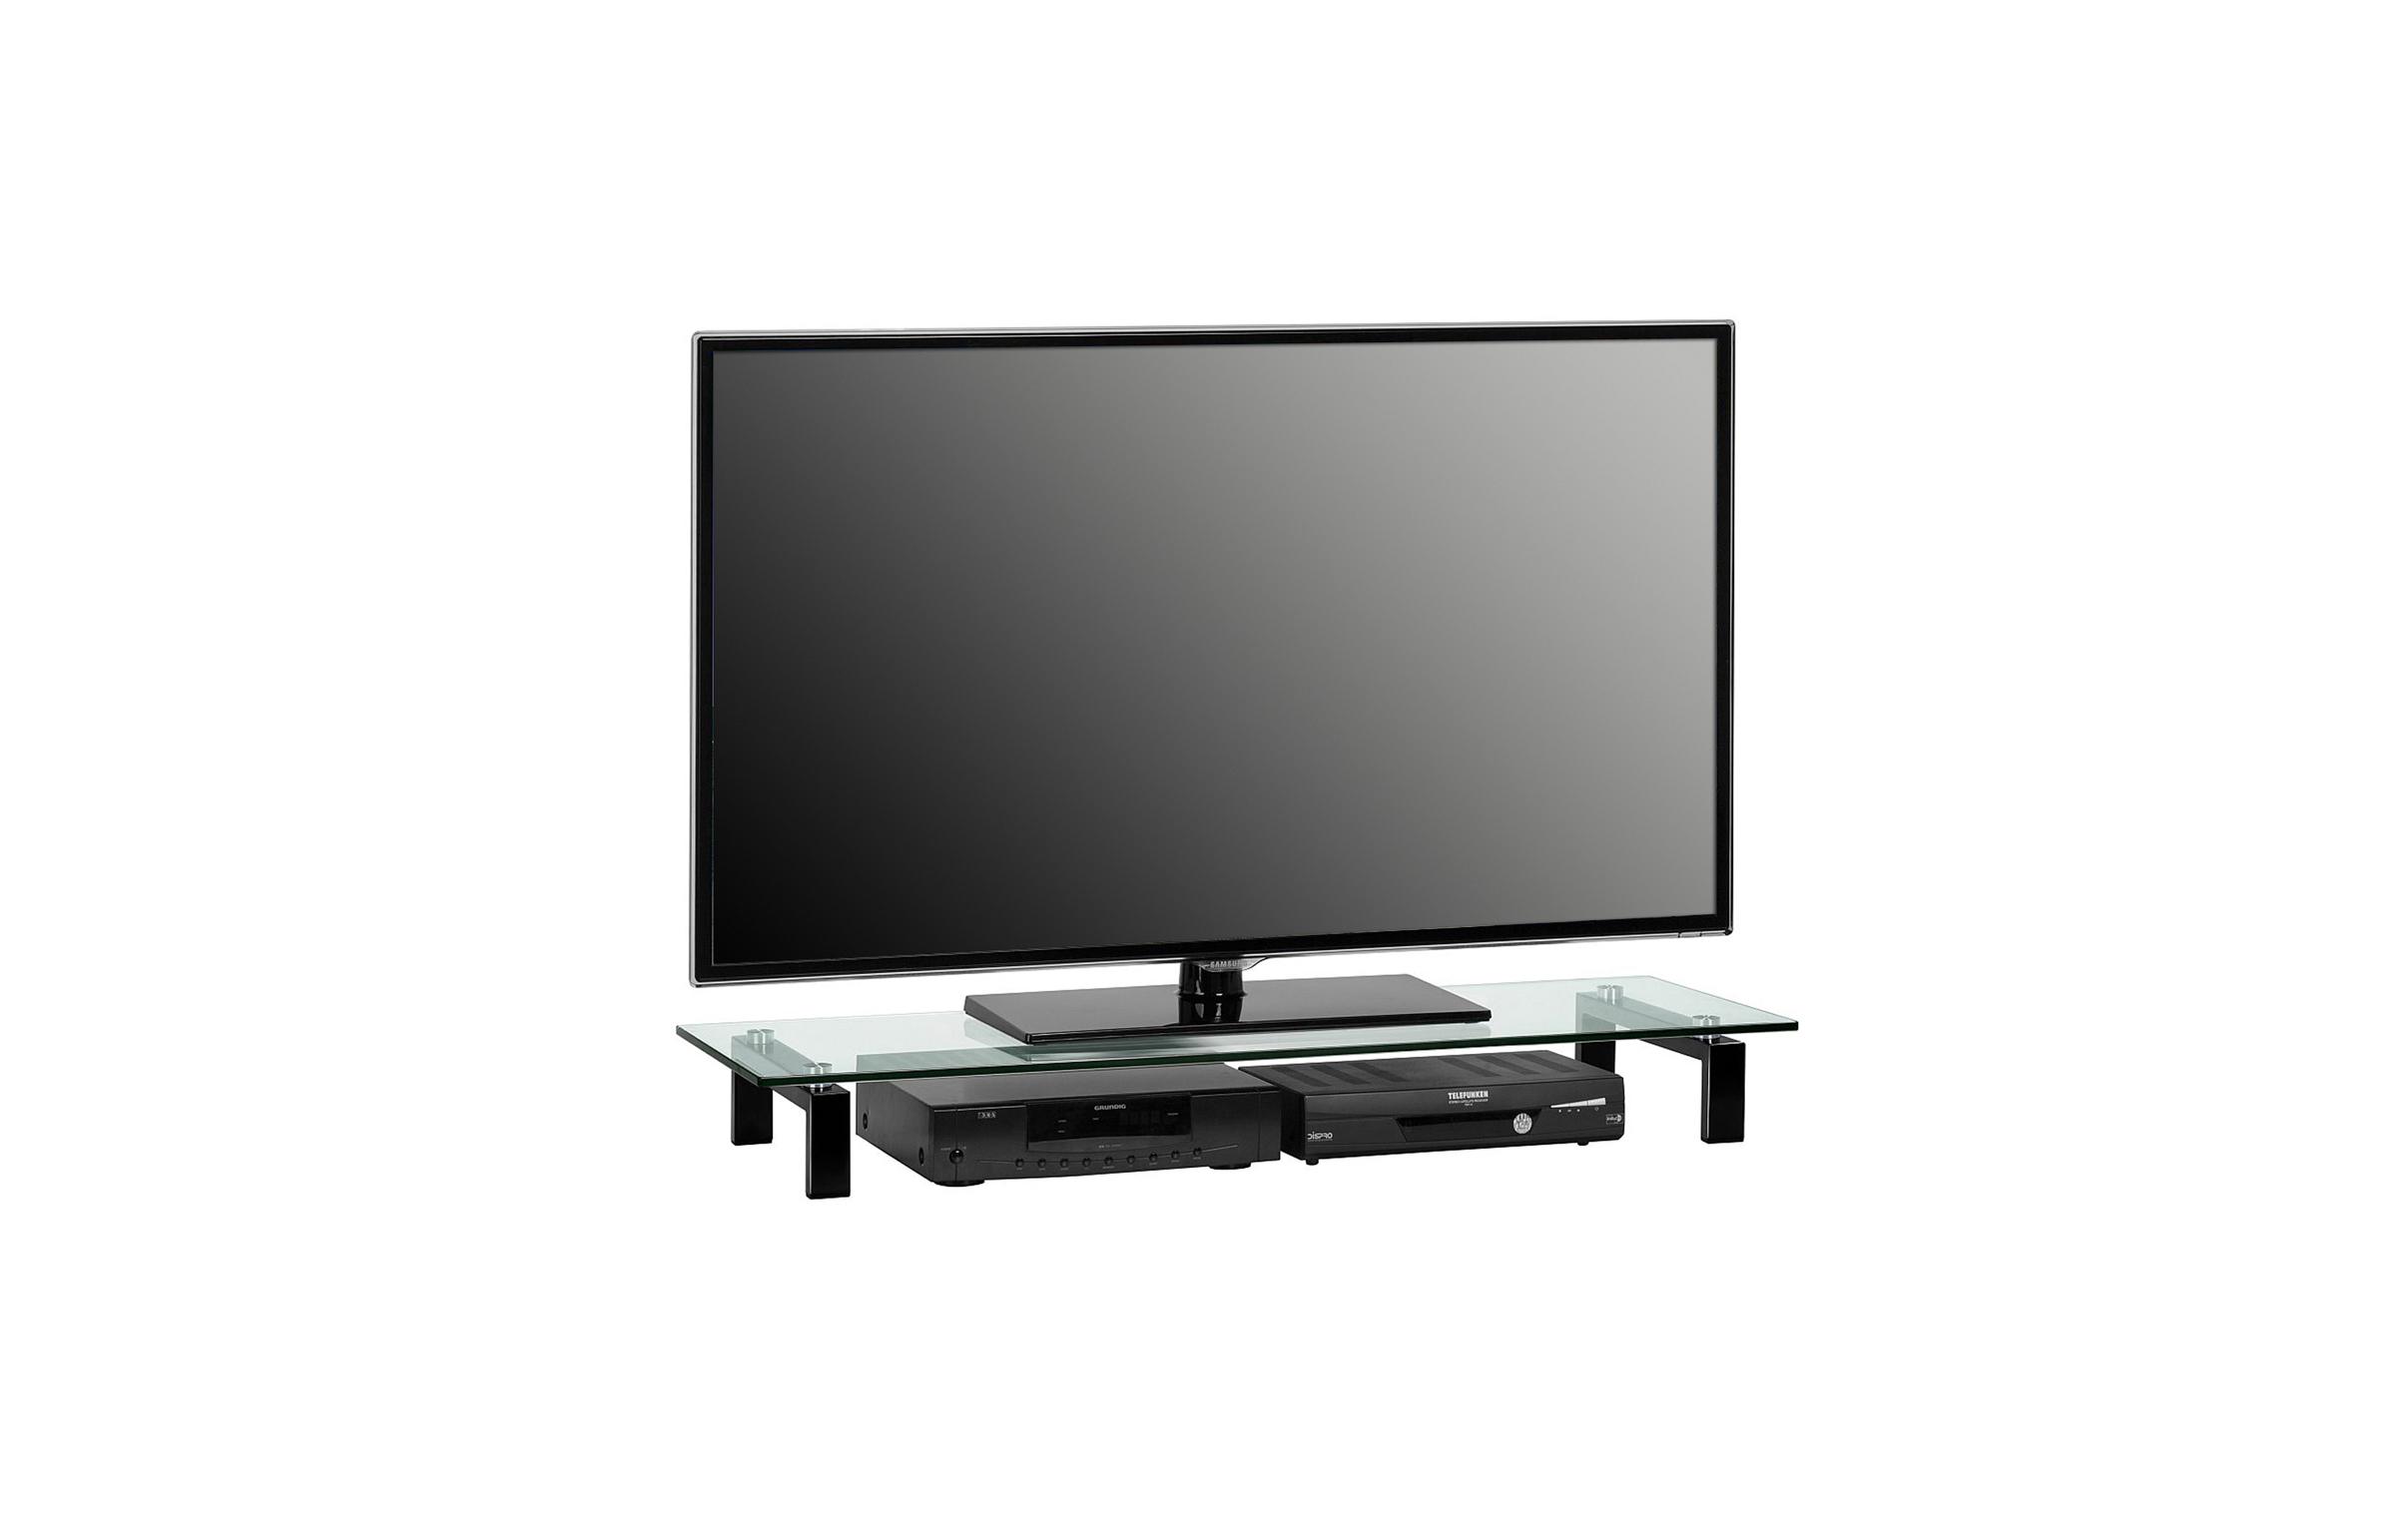 TV-Glasaufsatz Podest ca 110 cm breit Media 160...